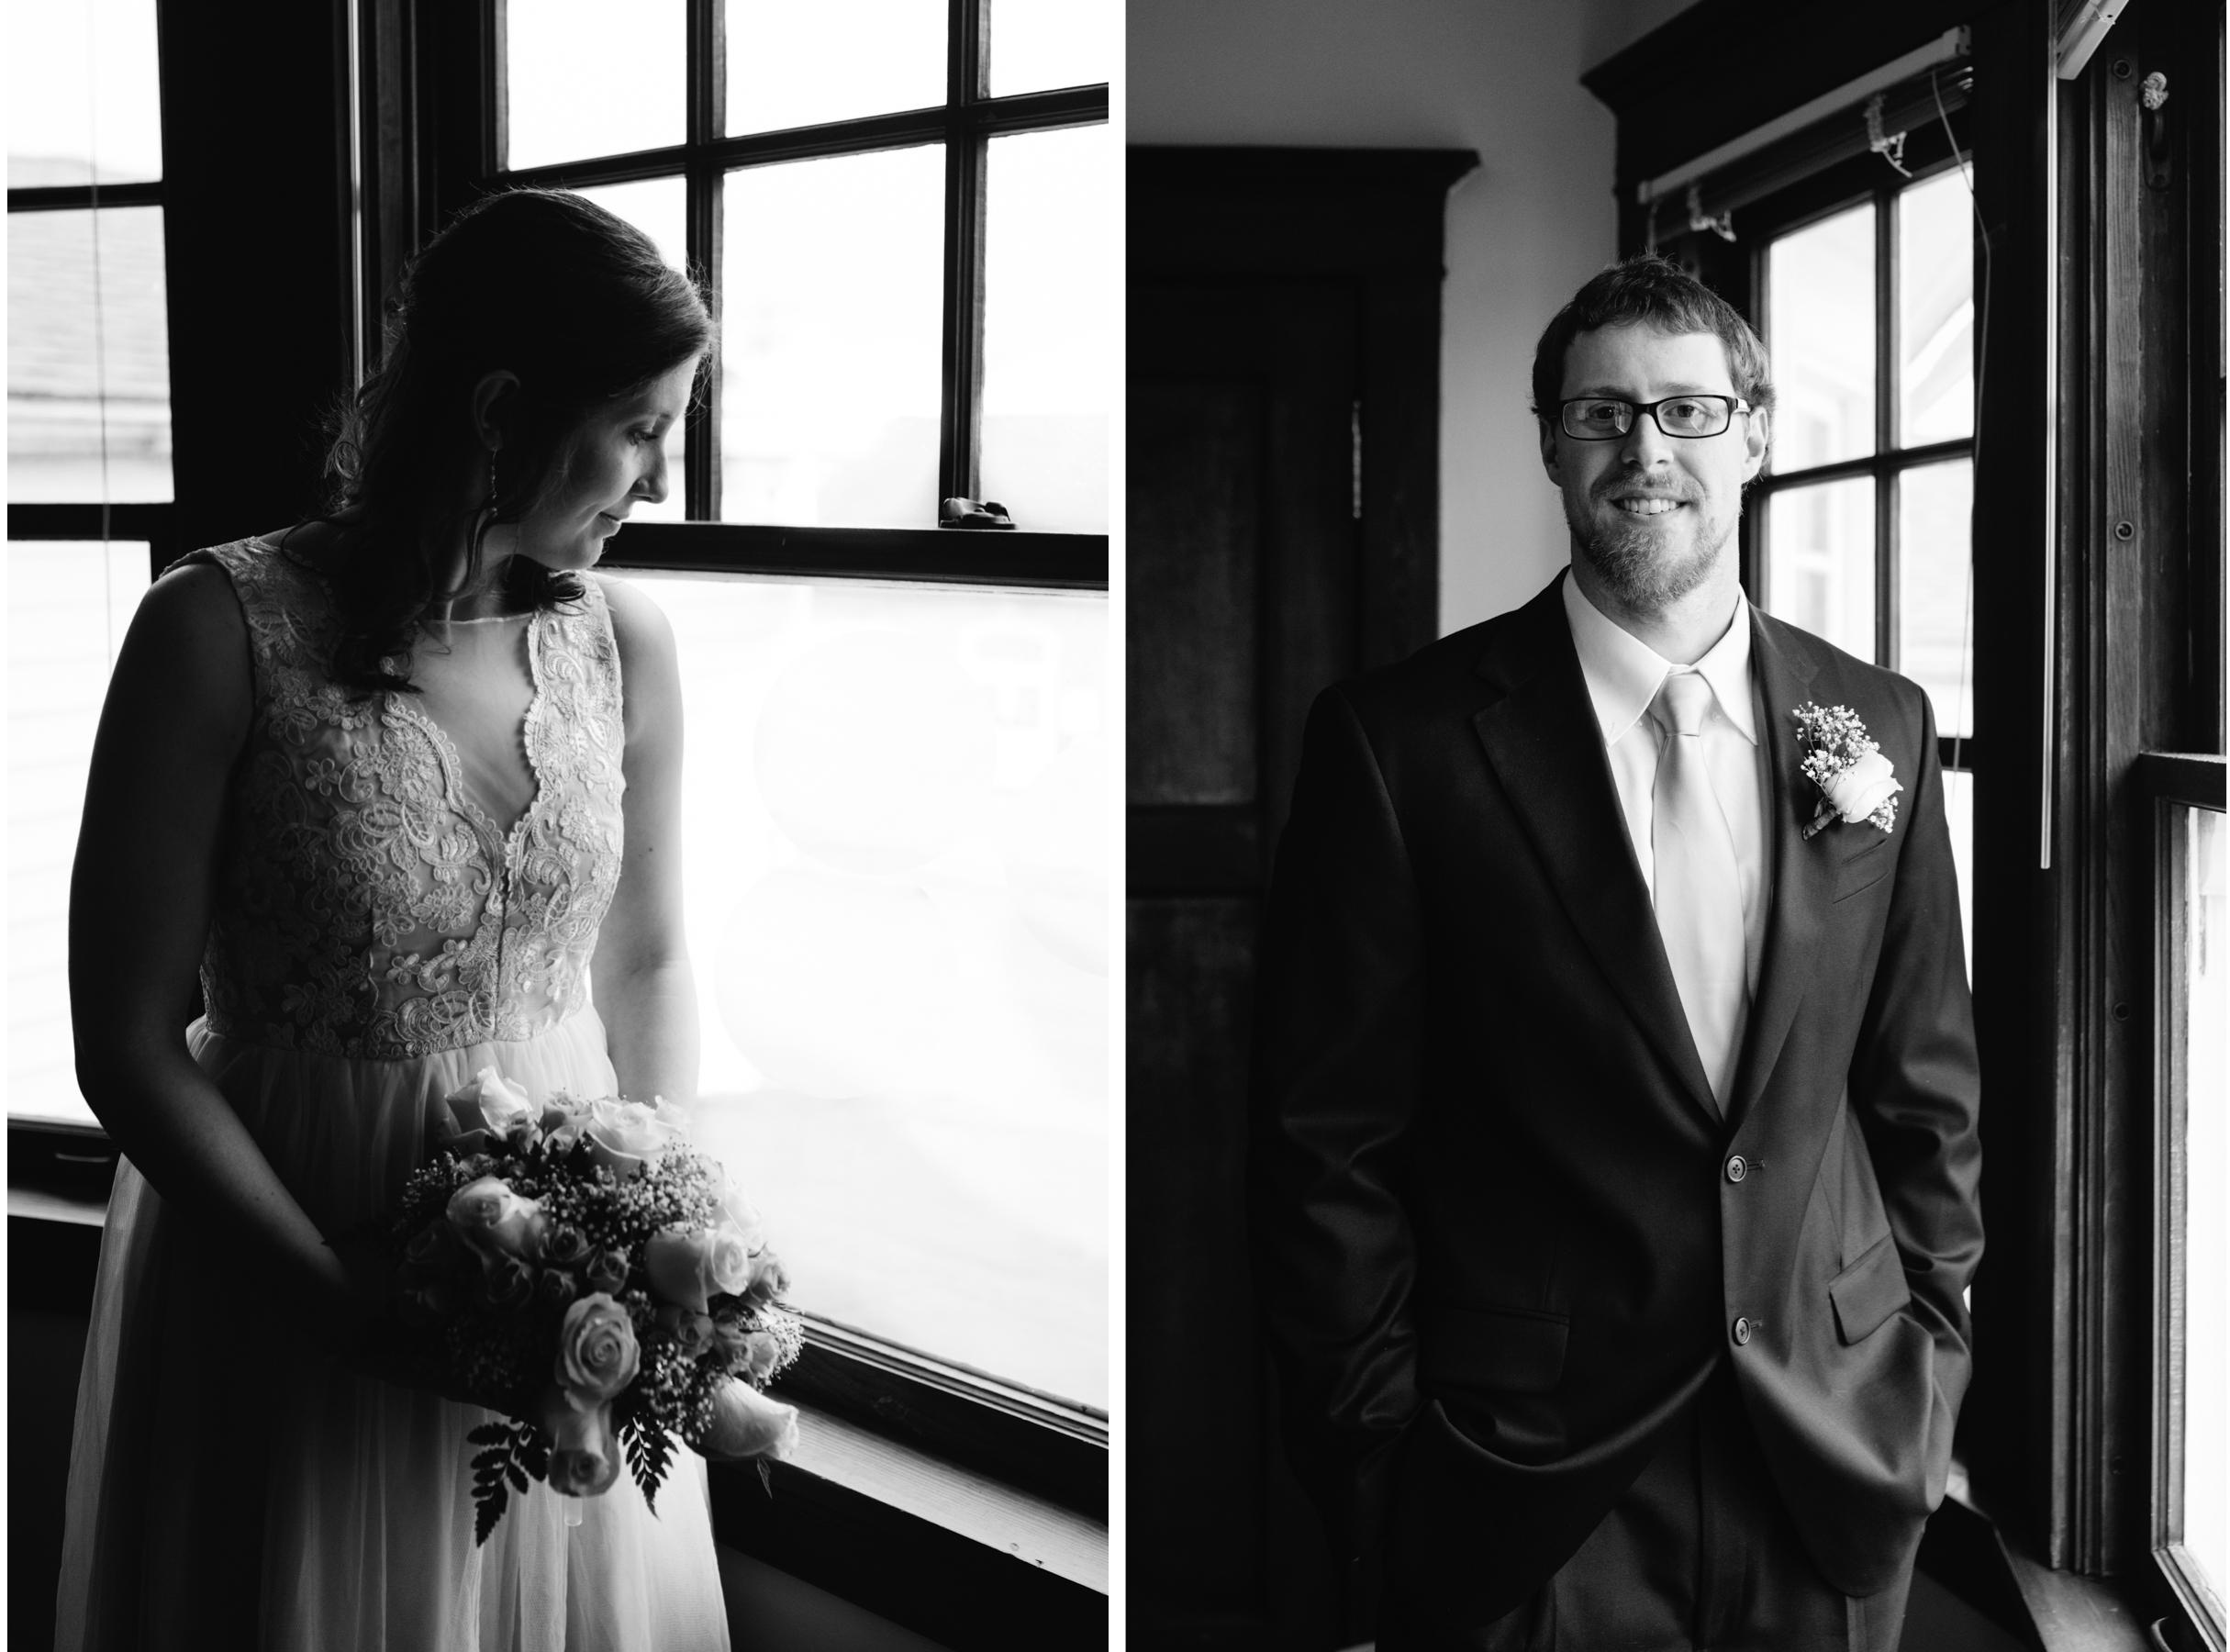 ligonier wedding mariah fisher photography.jpg